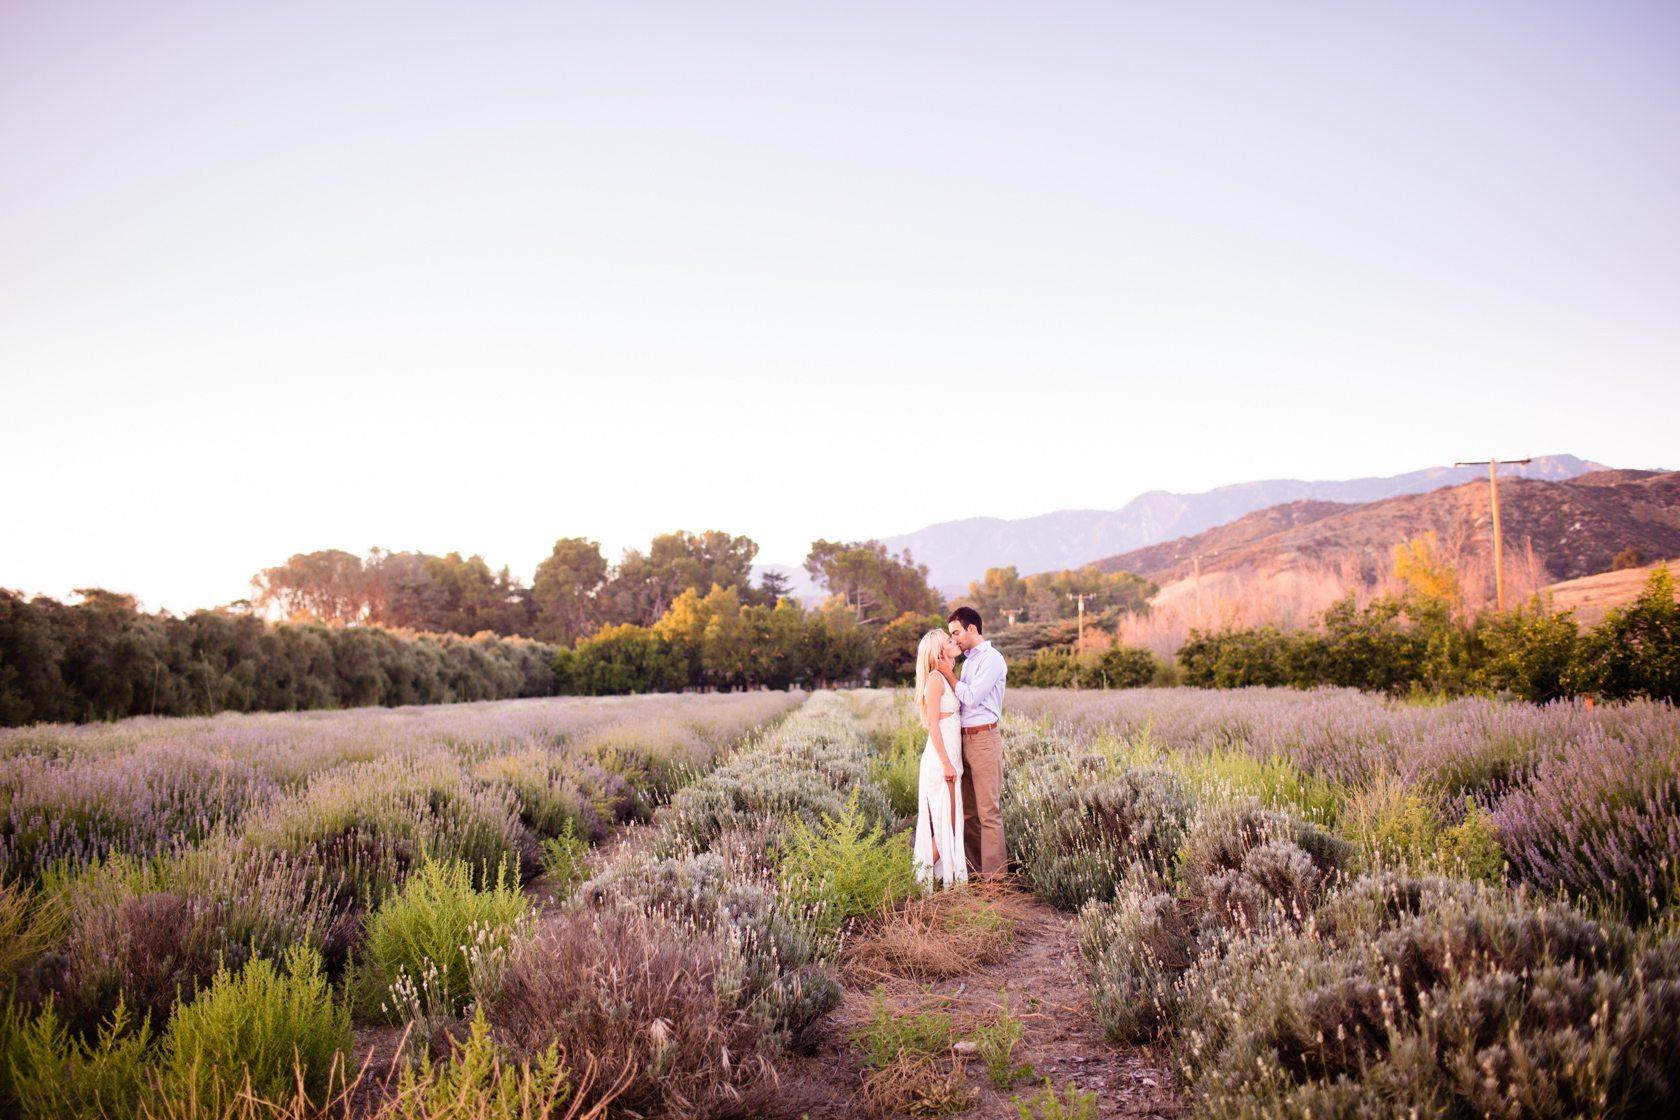 Highland_Springs_Lavender_Field_Engagement_41.jpg